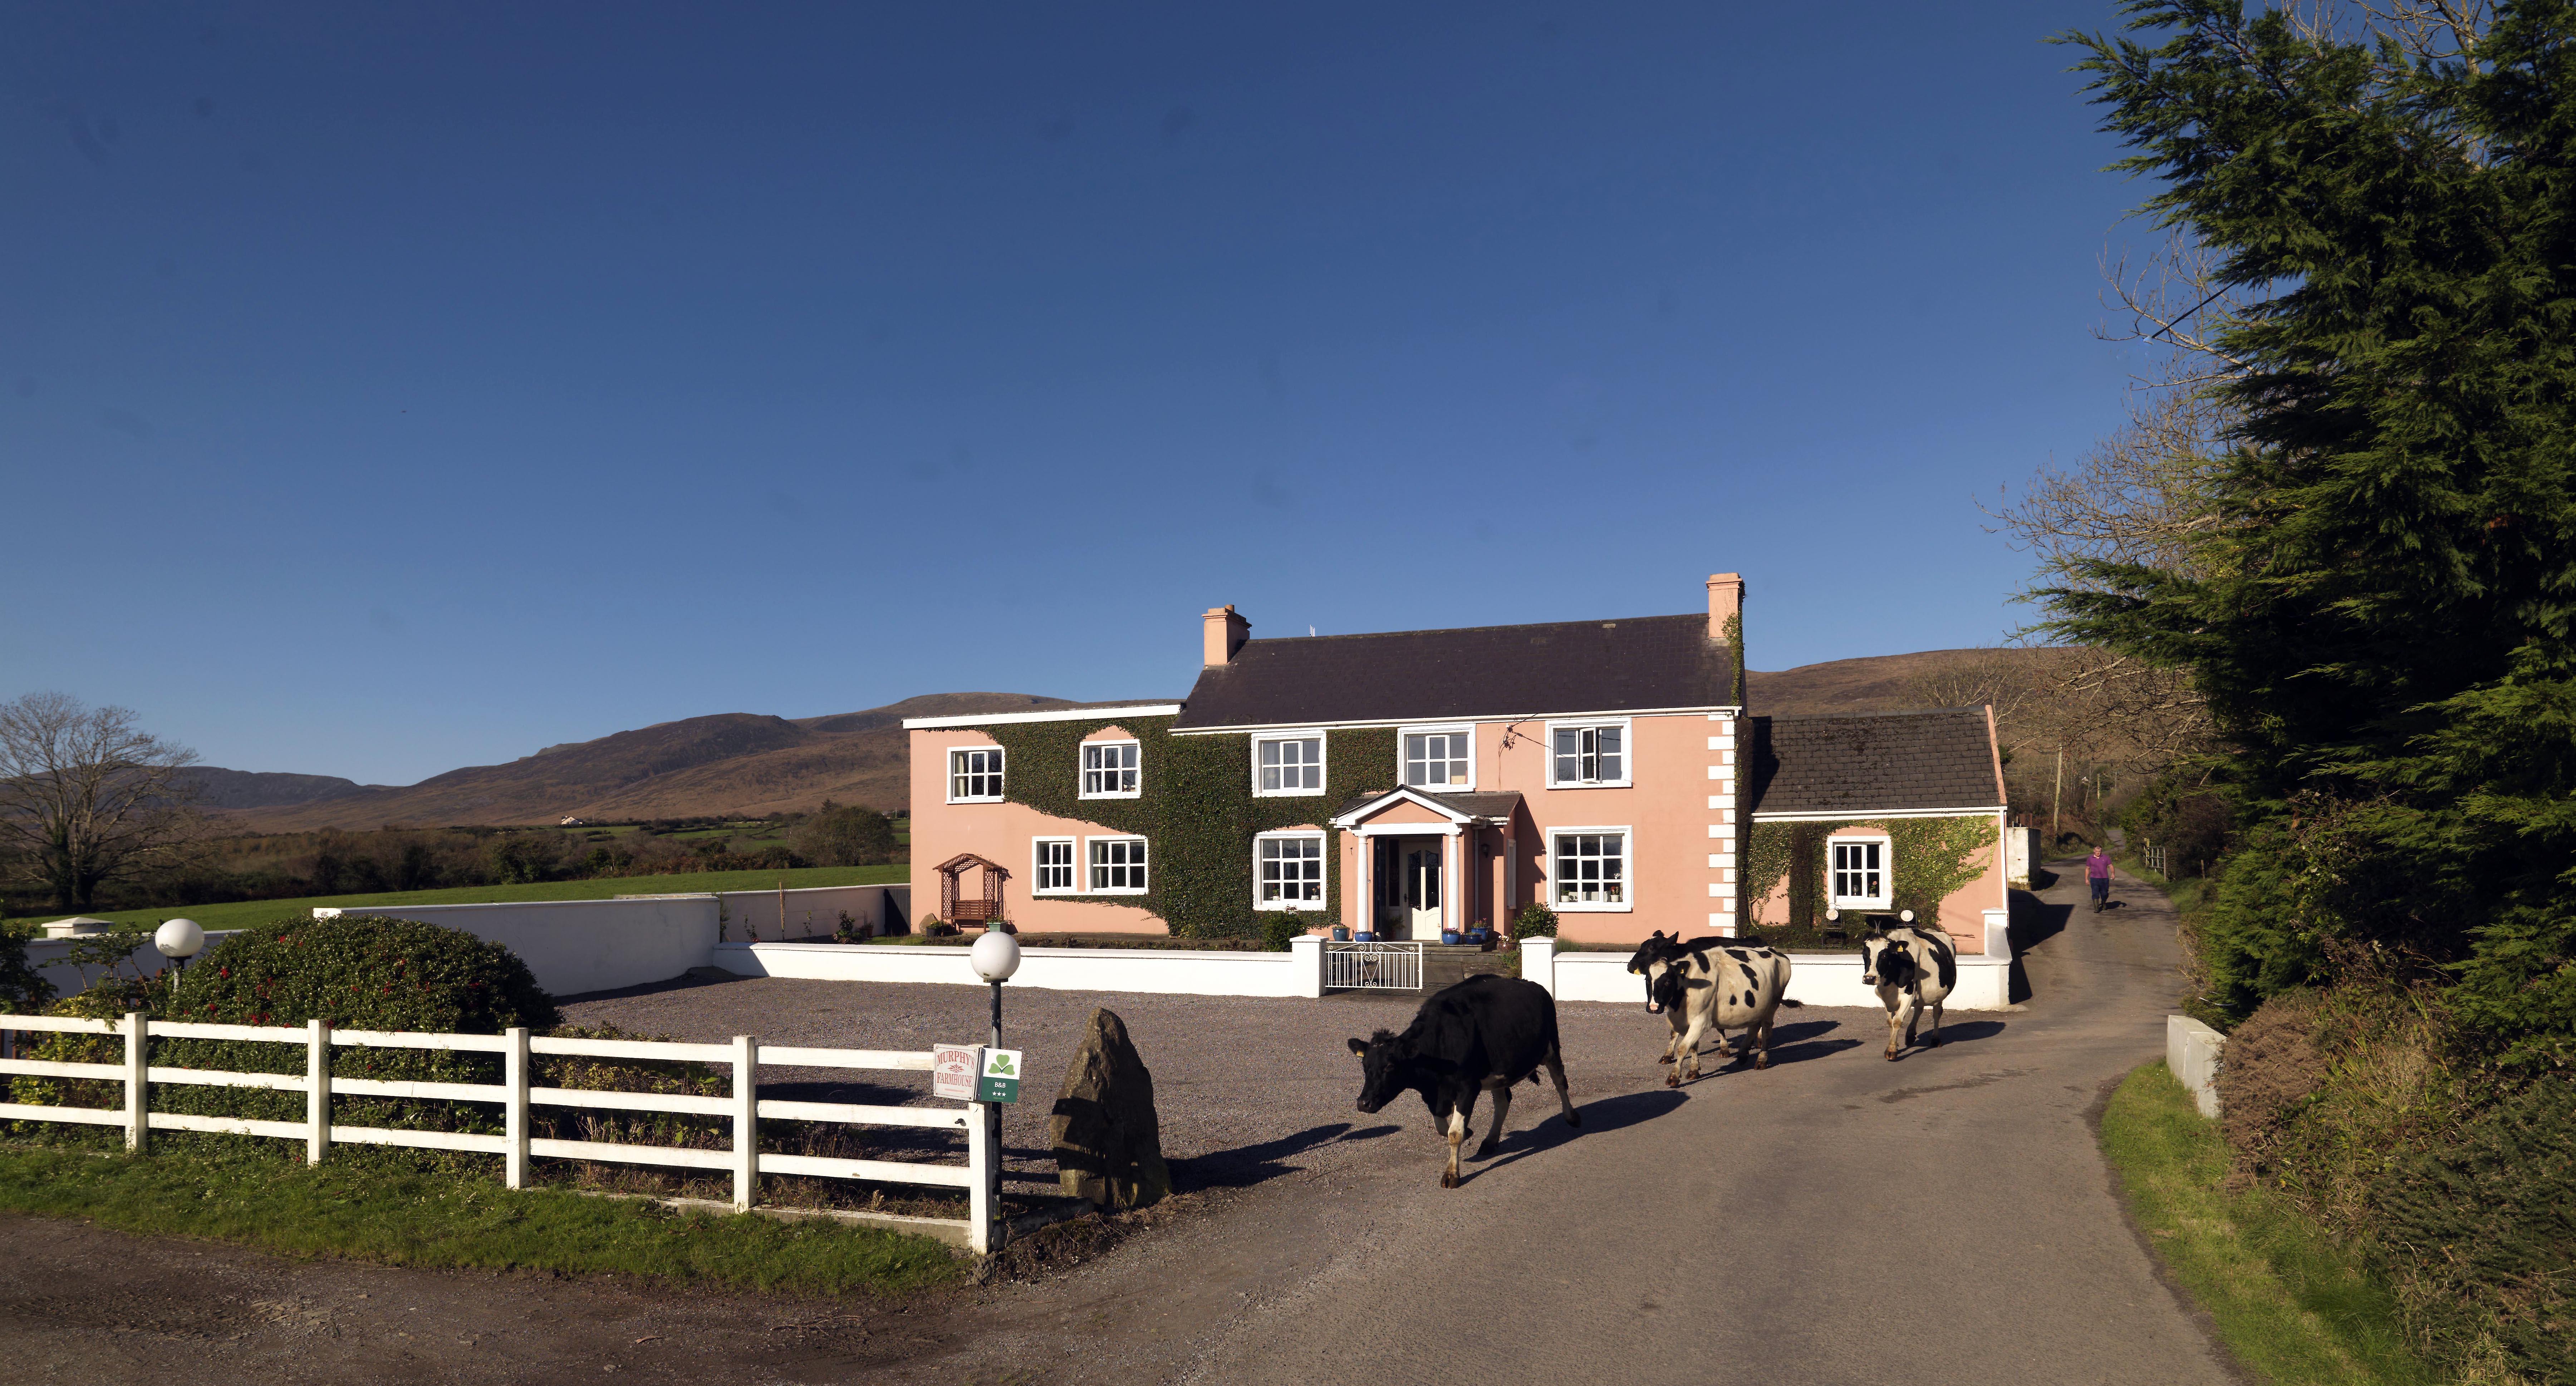 MURPHY'S FARMHOUSE